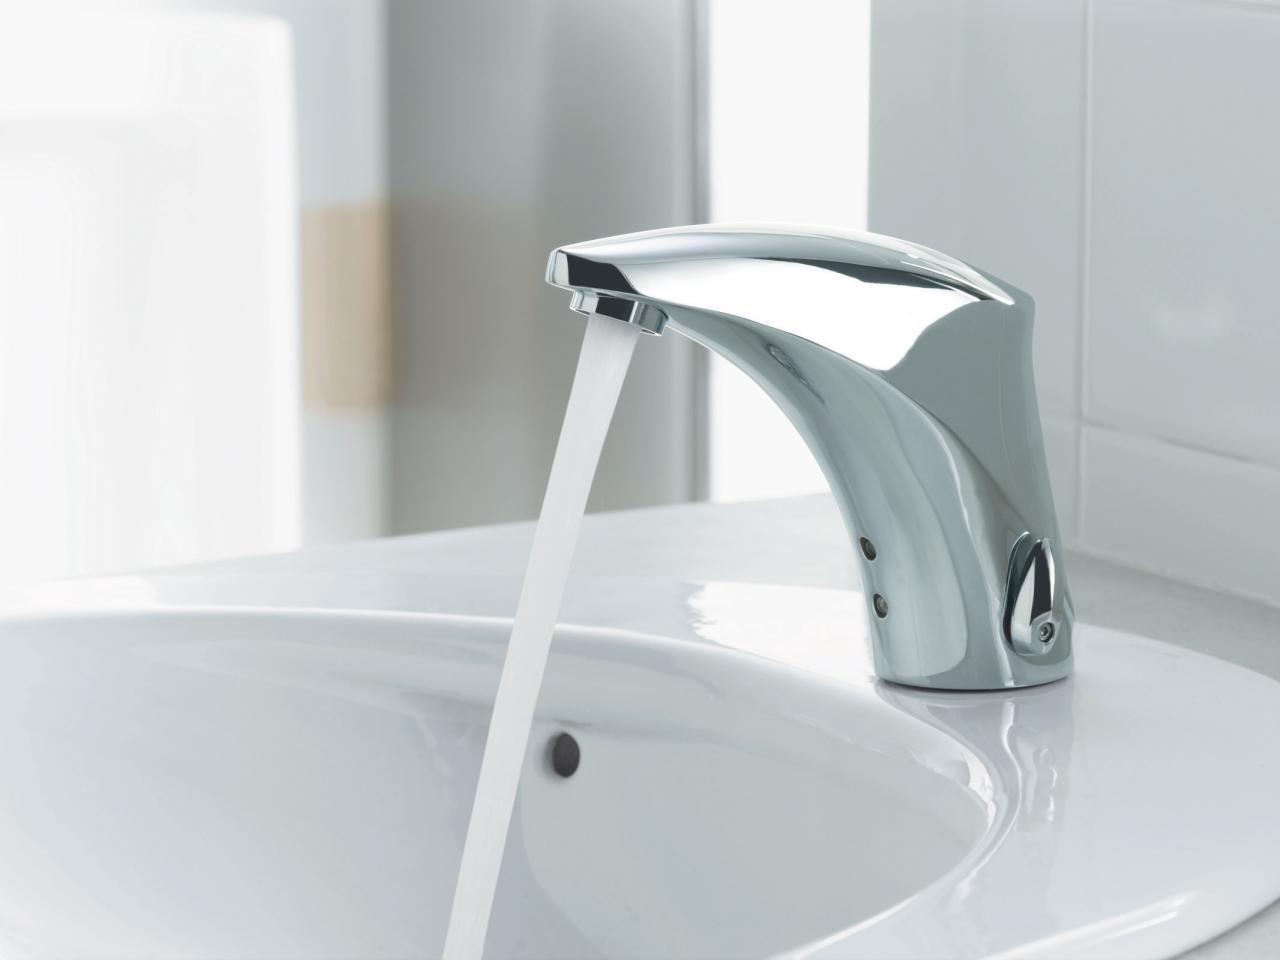 Ideas, kohler motion sensor kitchen faucet kohler motion sensor kitchen faucet bath shower best kitchen and bathroom faucet from moen faucet 1280 x 960 jpeg.